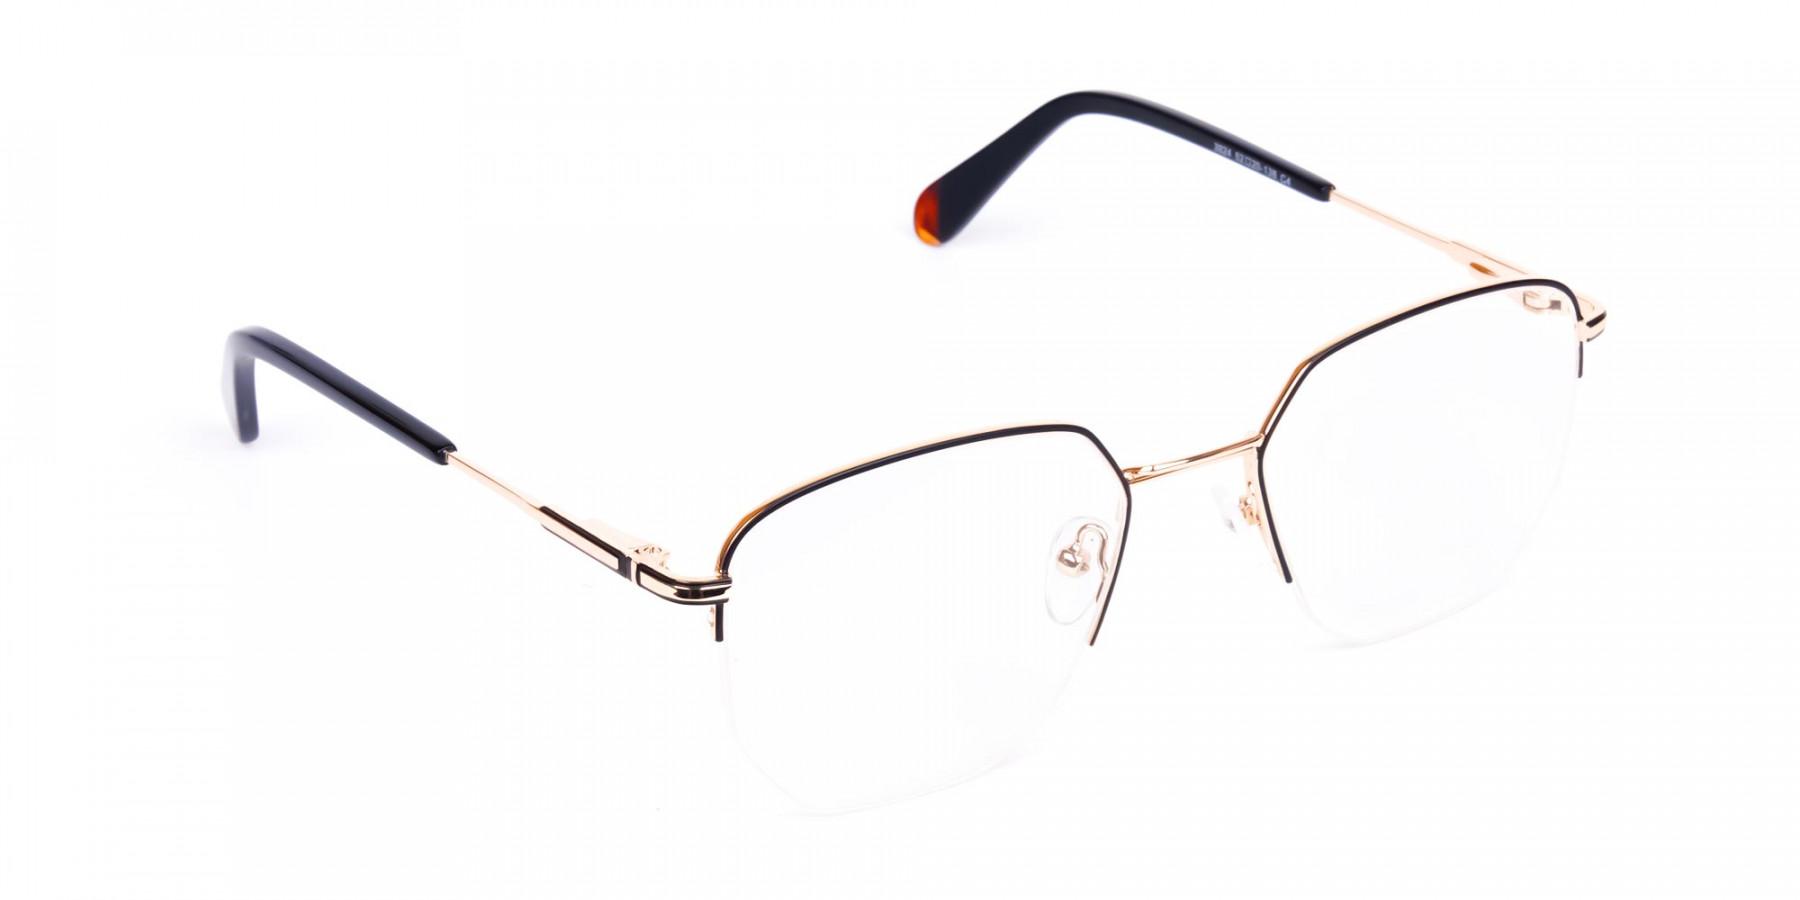 Black-Gold-Geometric-Aviator-Glasses-1